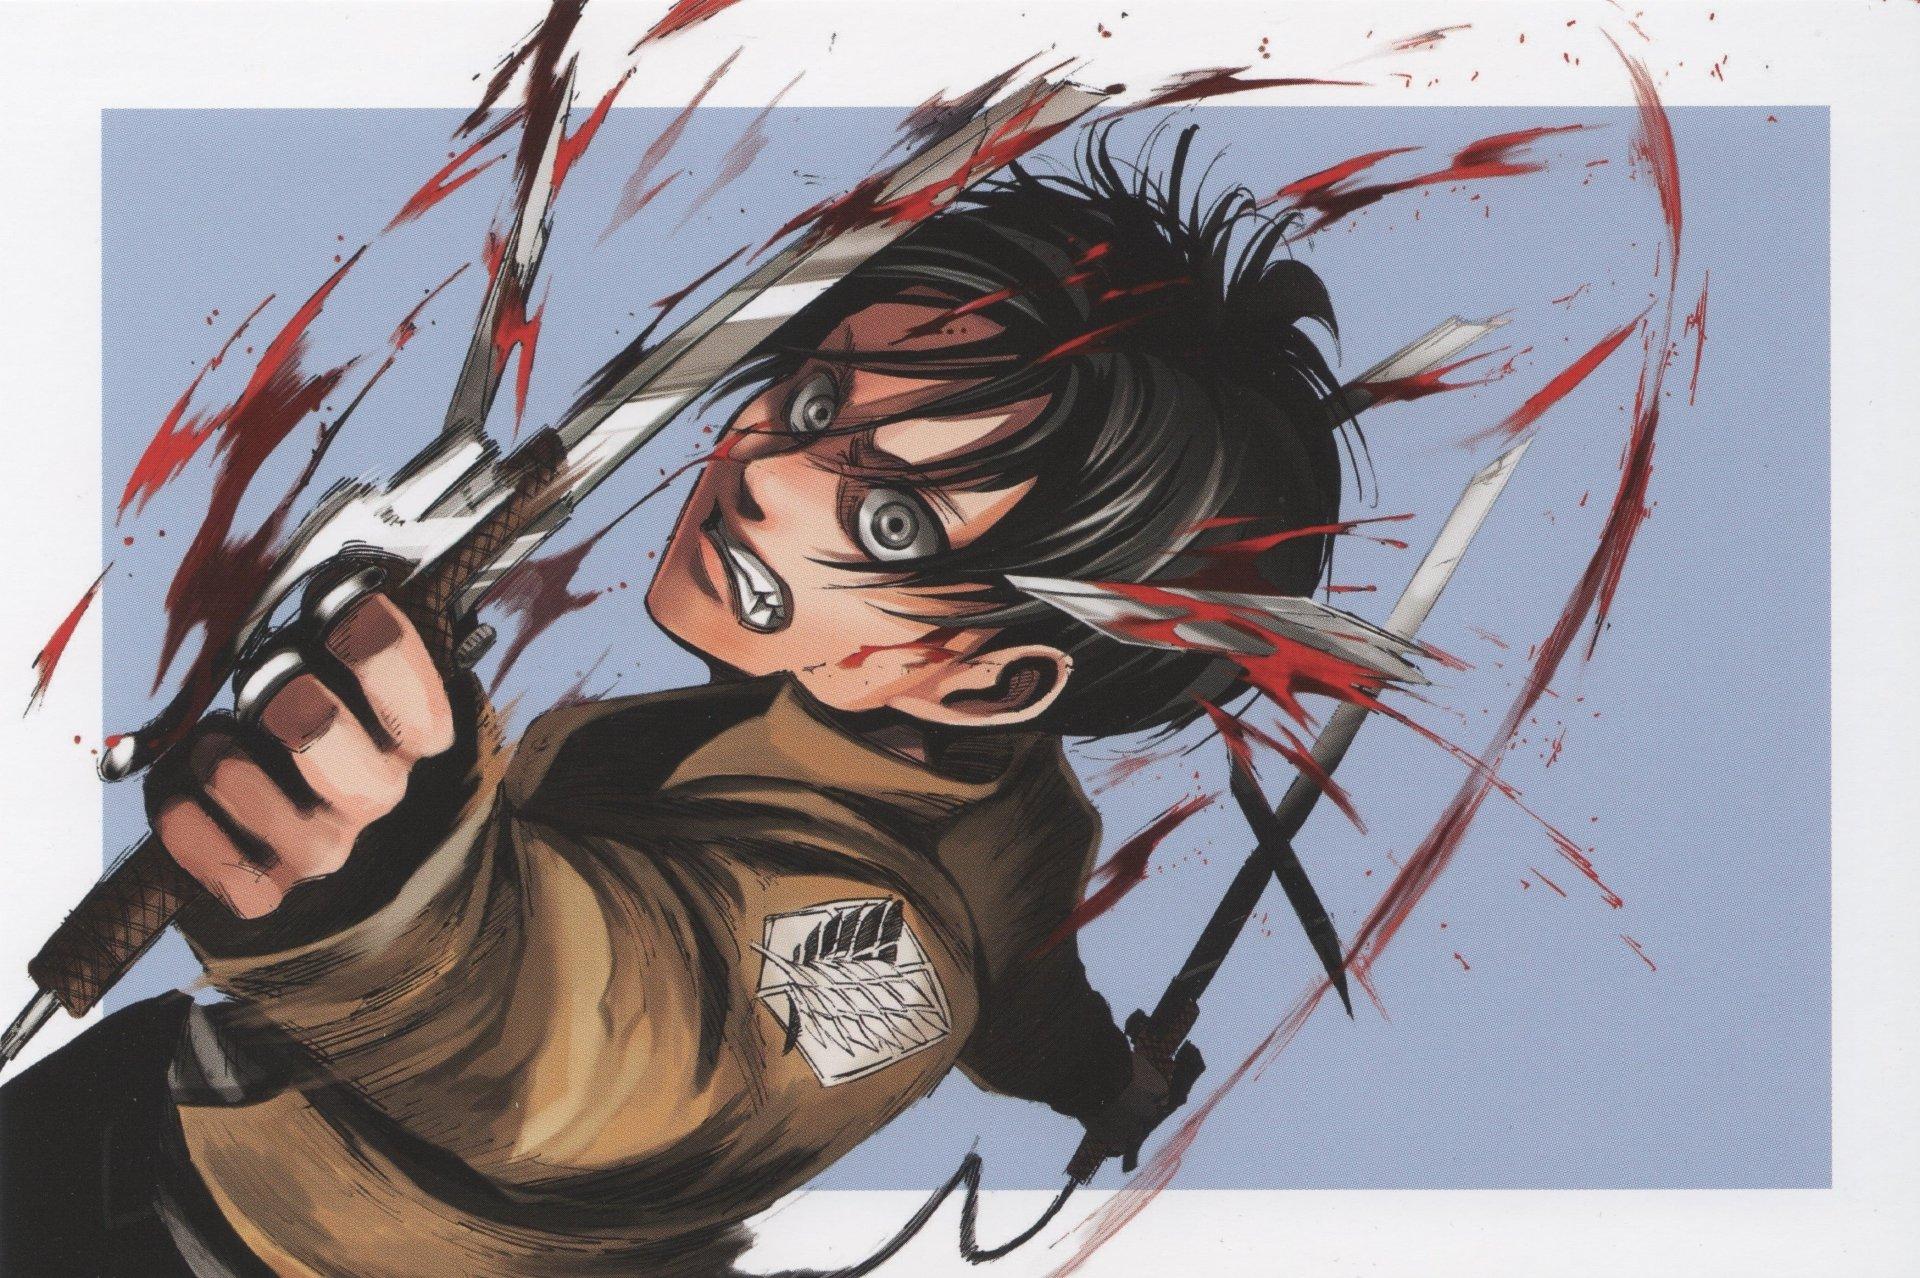 Download wallpapers evil eren yeager, 4k, attack on titan, fire, manga, shingeki no kyojin, green eyes, eren yeager, attack on titan. Eren 4k Ultra HD Wallpaper | Background Image | 4185x2785 ...